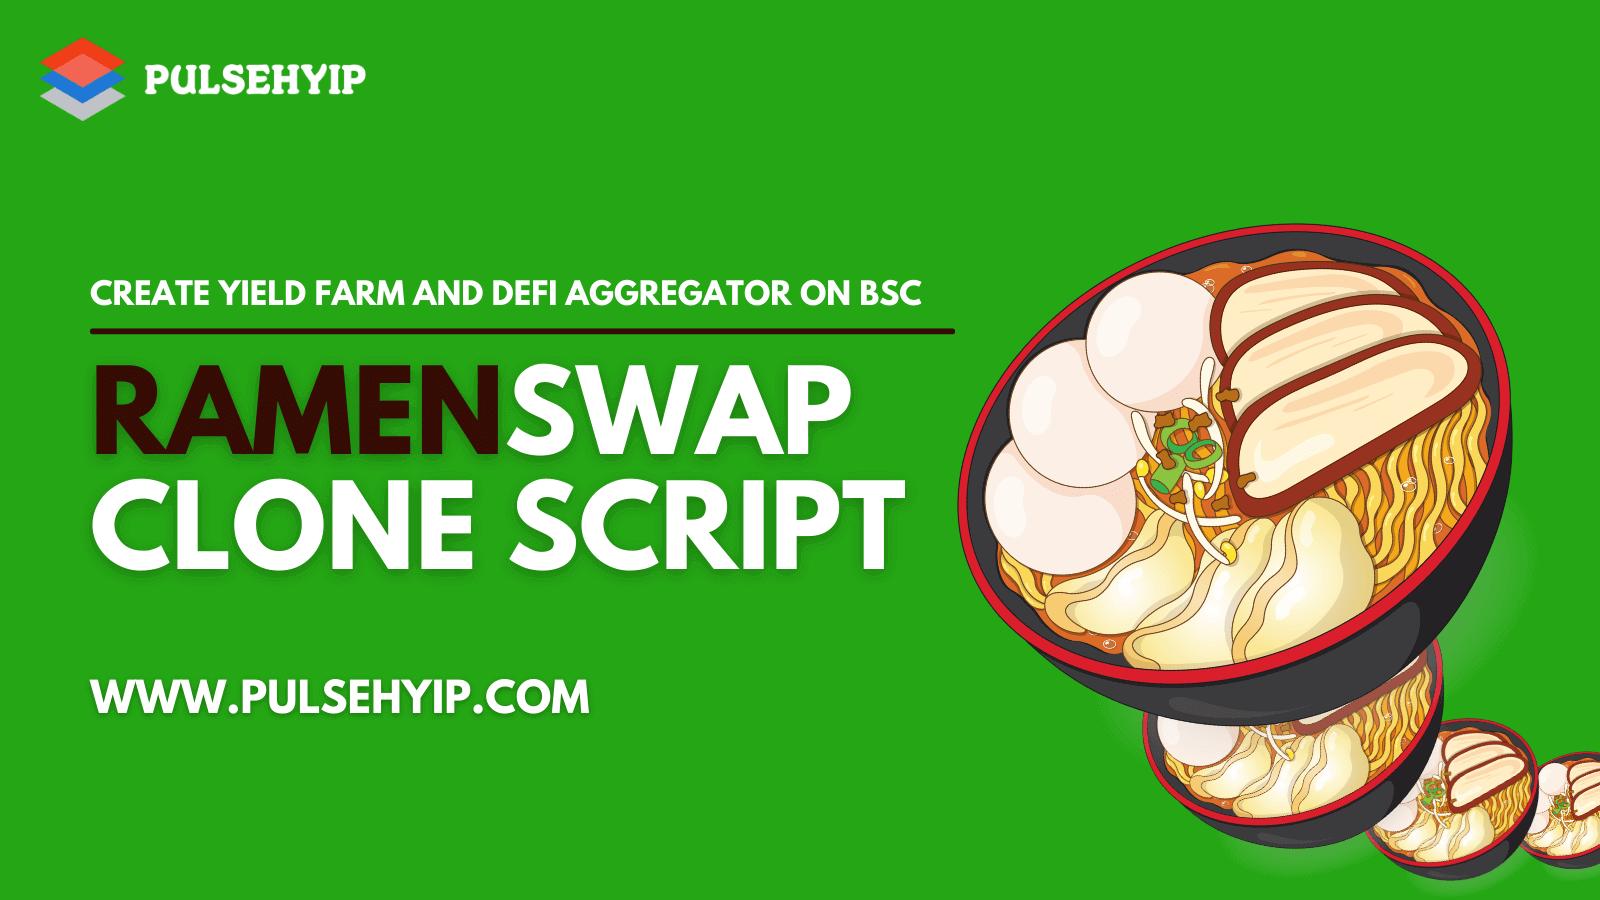 RamenSwap Clone Script to Launch a Decentralized Exchange Protocol like RamenSwap on Binance Smart Chain